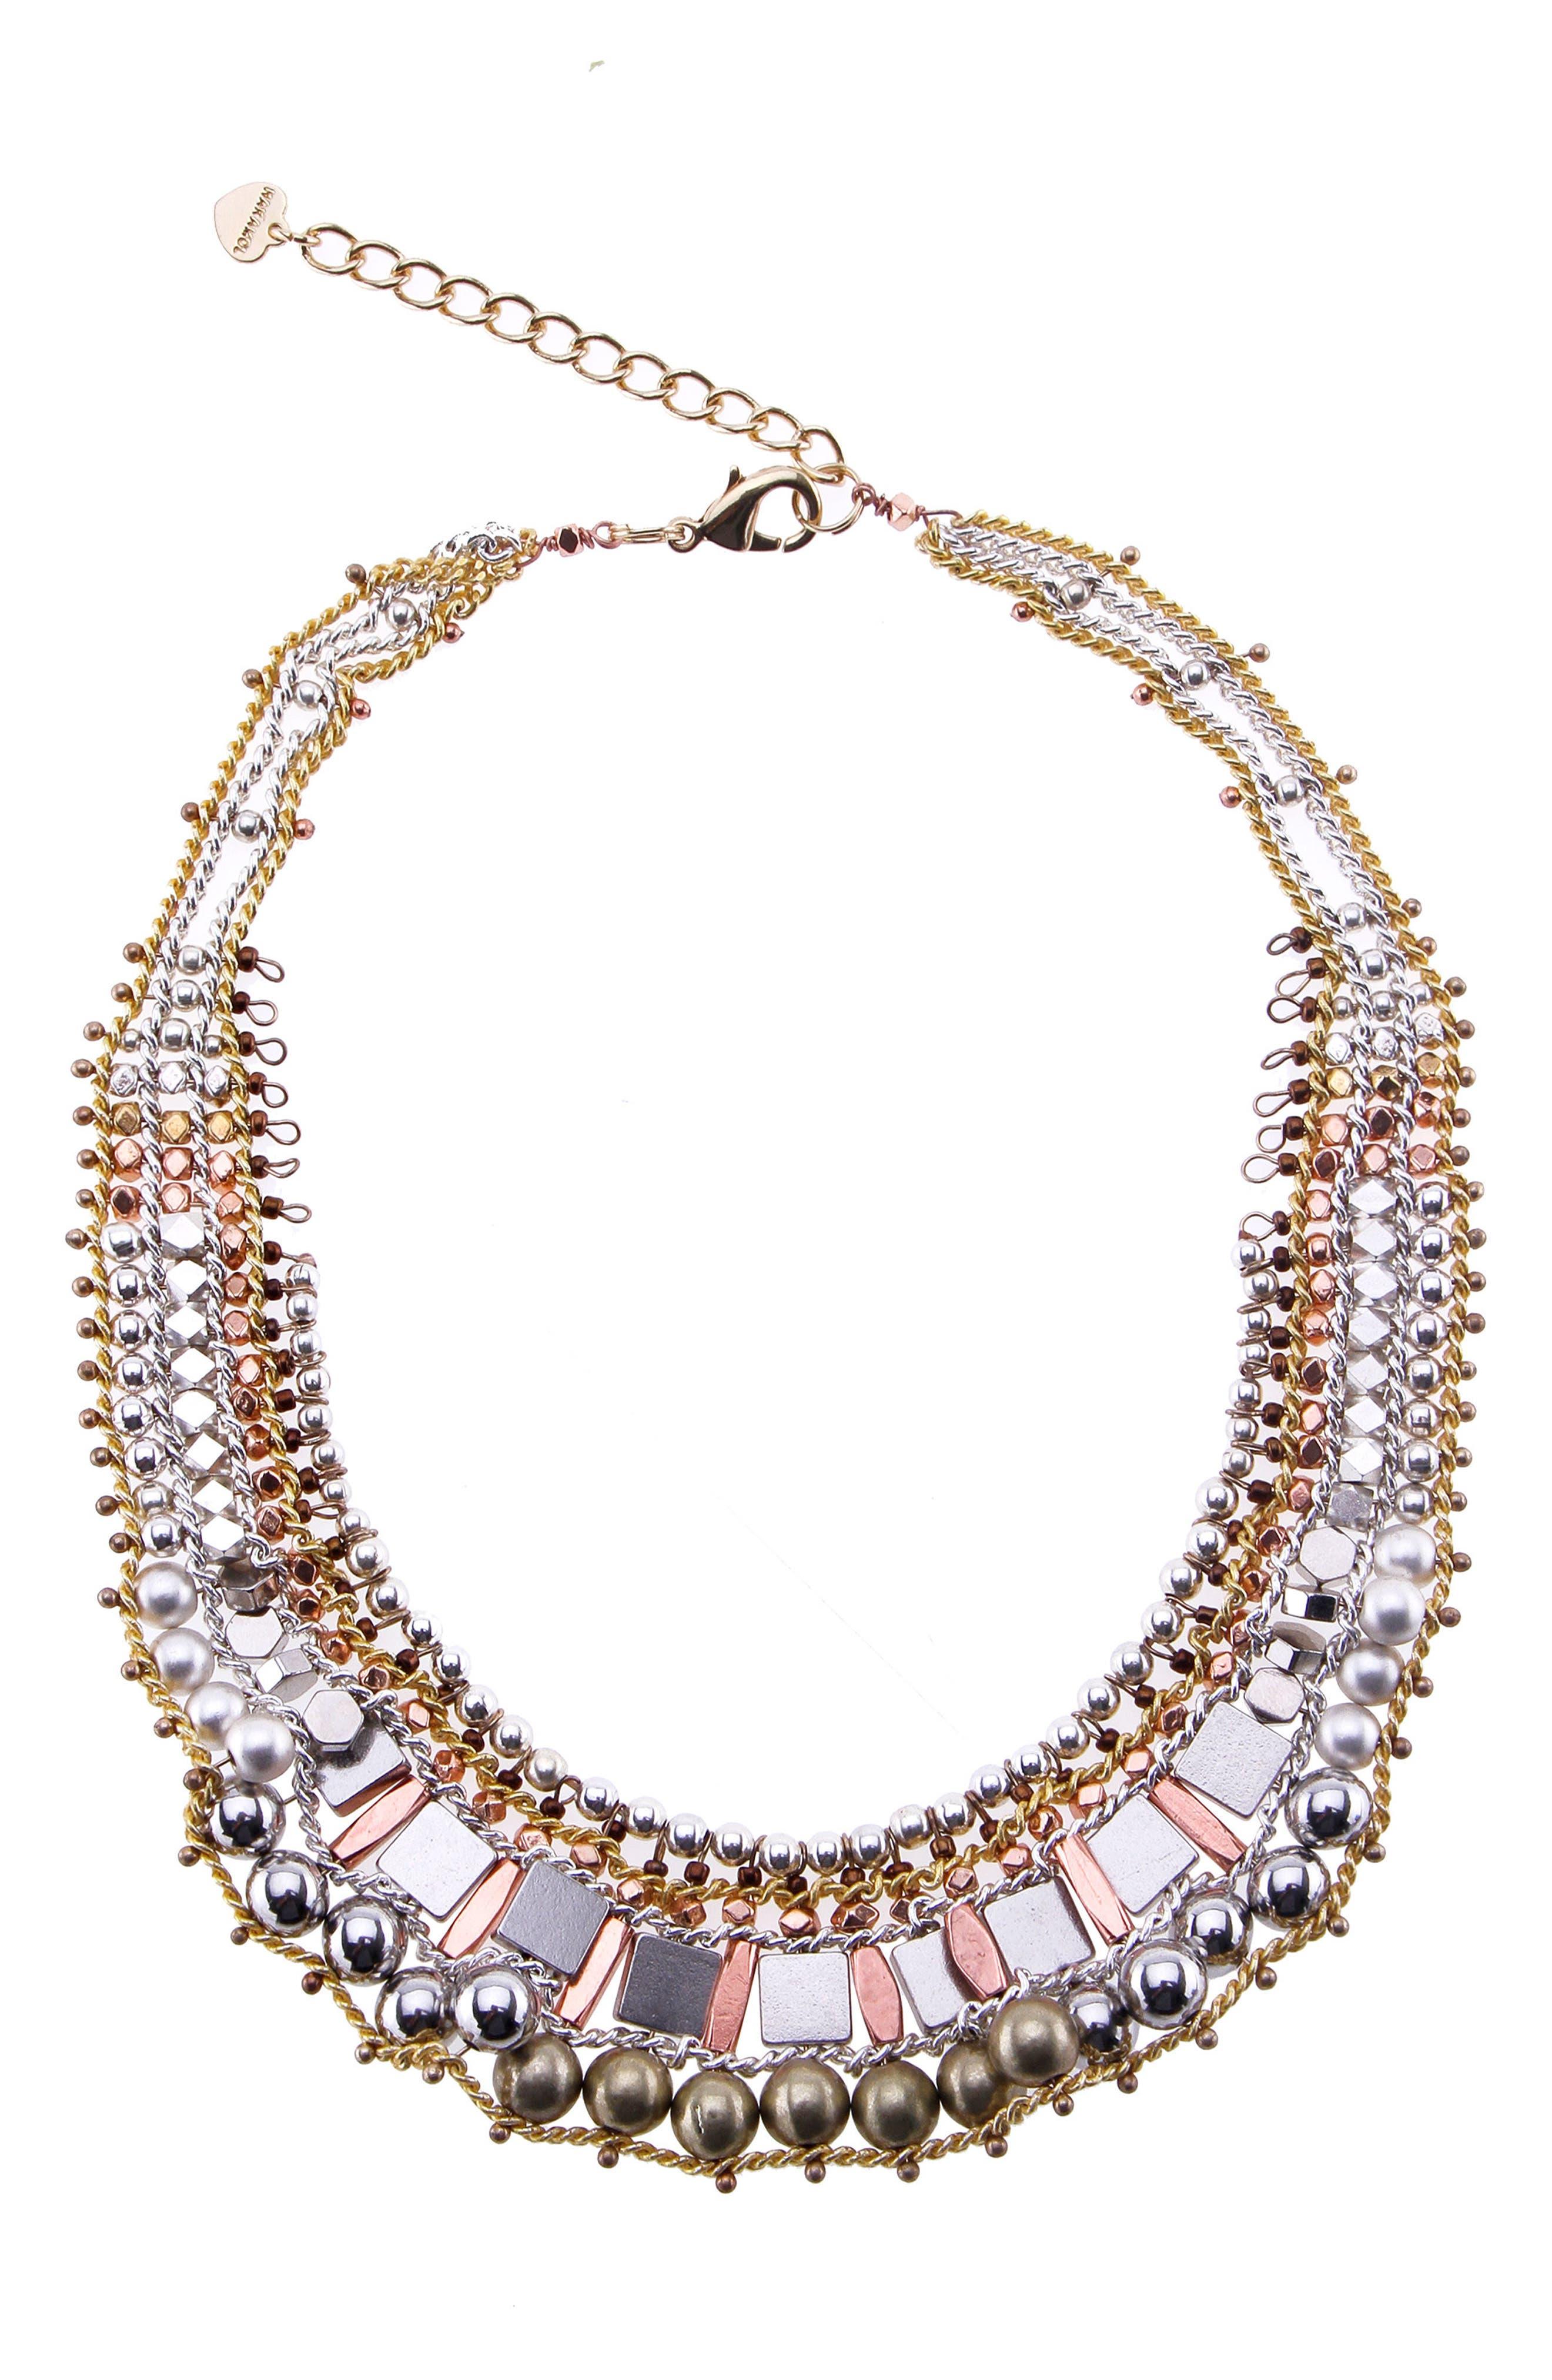 Mixed Metal Collar Necklace,                             Main thumbnail 1, color,                             Gold/ Silver